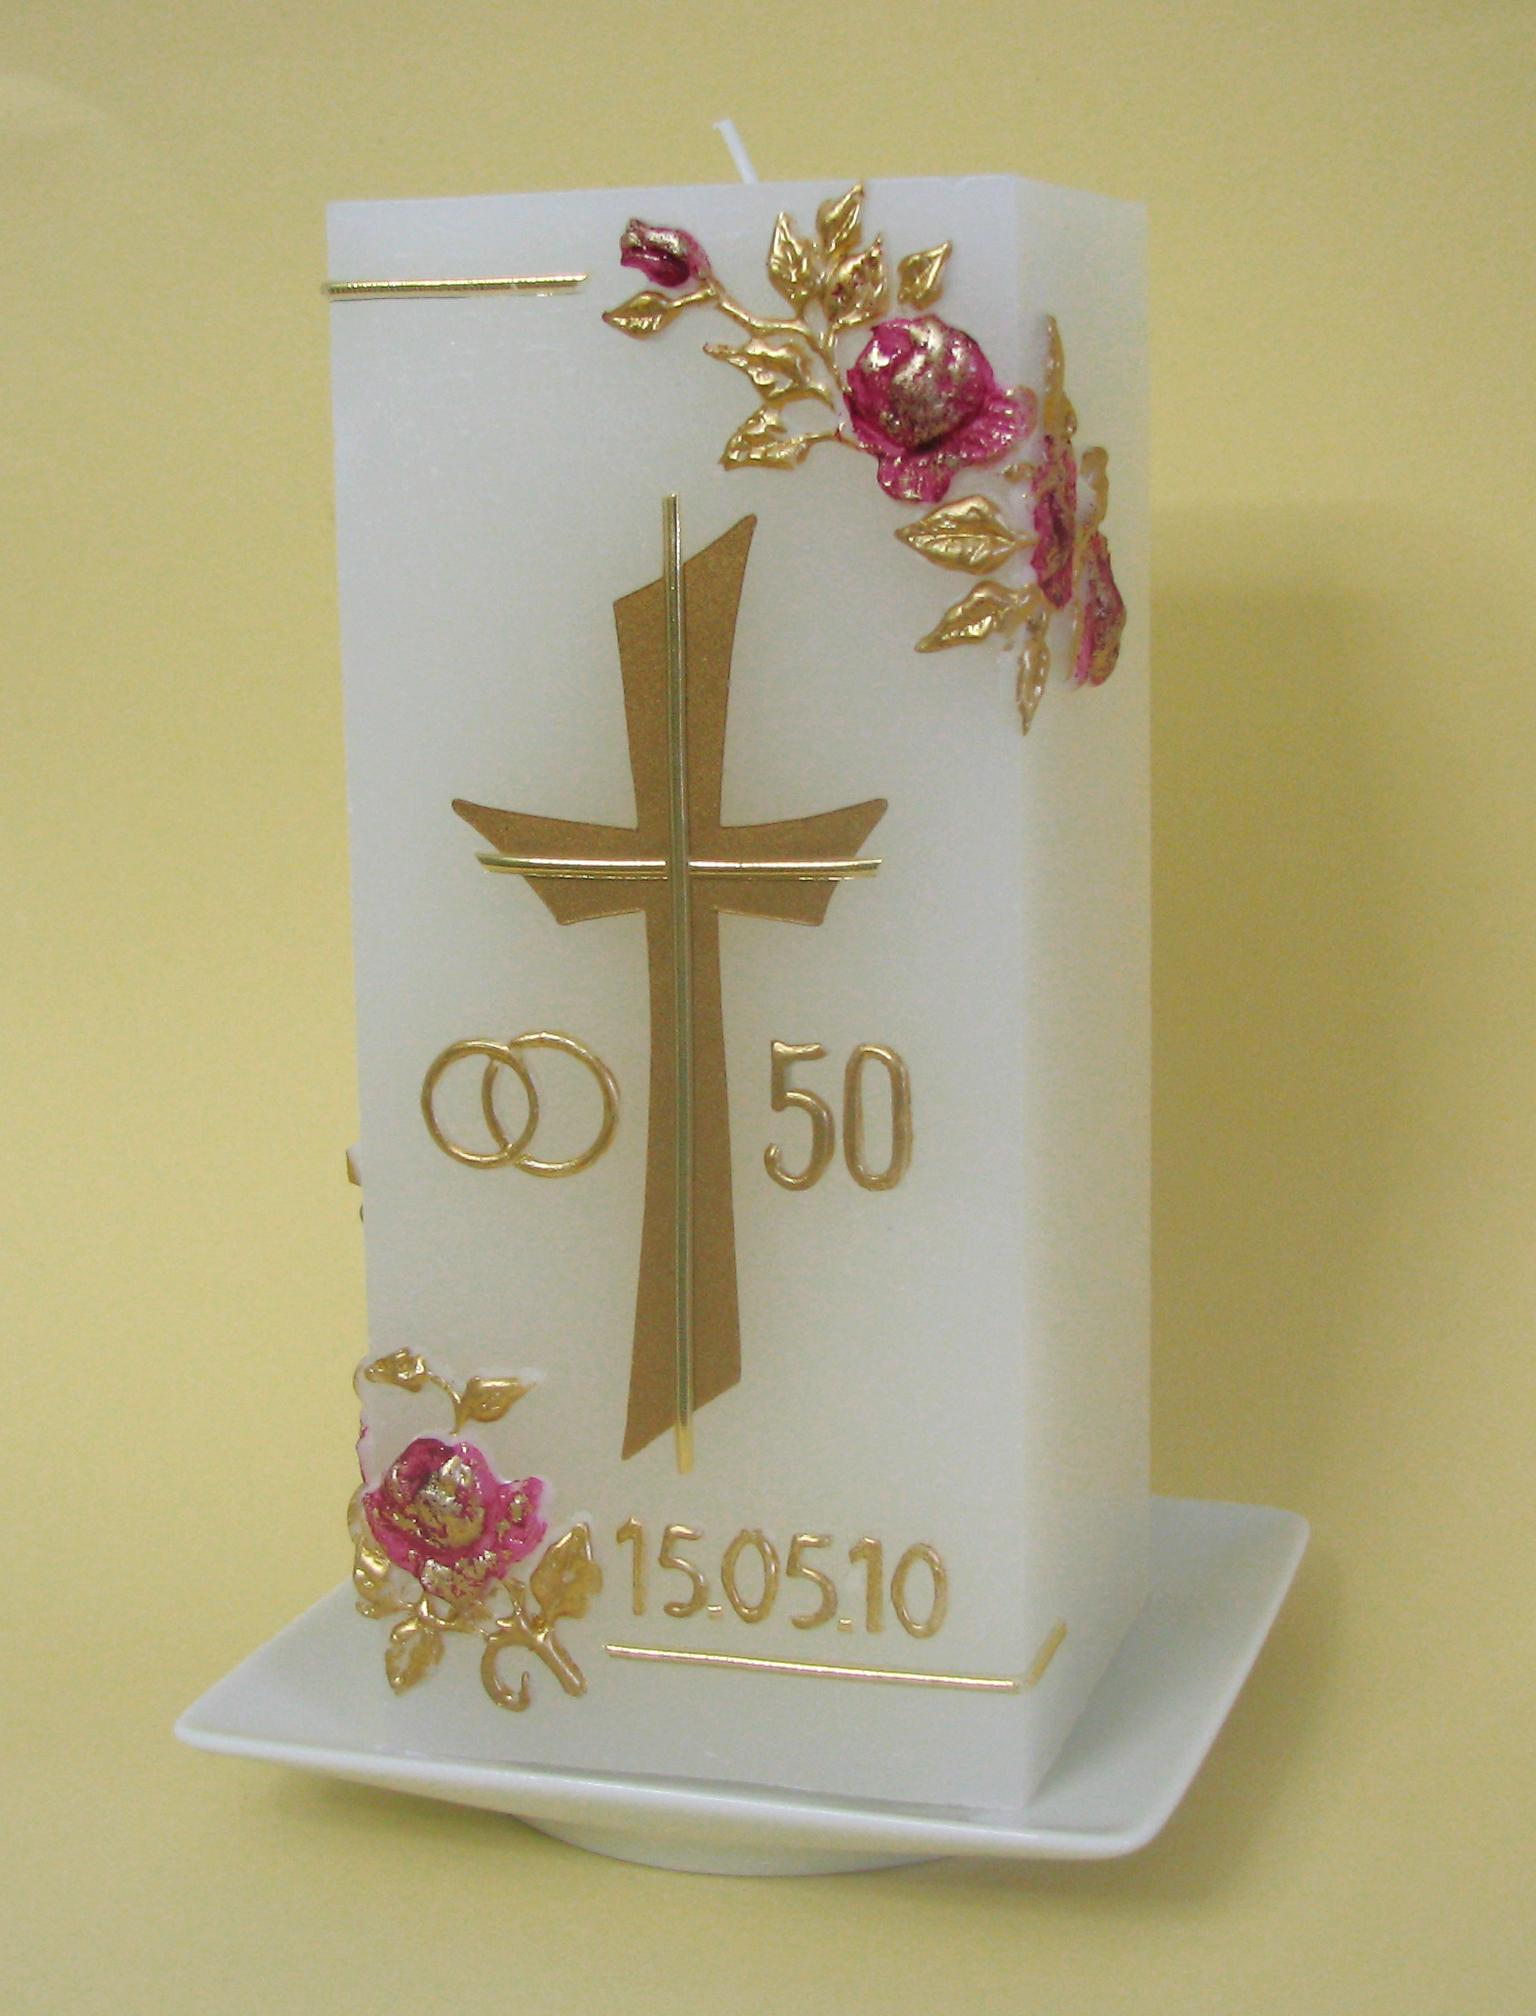 HE-0051, quadratisch, HxB ca 20 cm x 7,5 cm, Preis ca. € 28,--